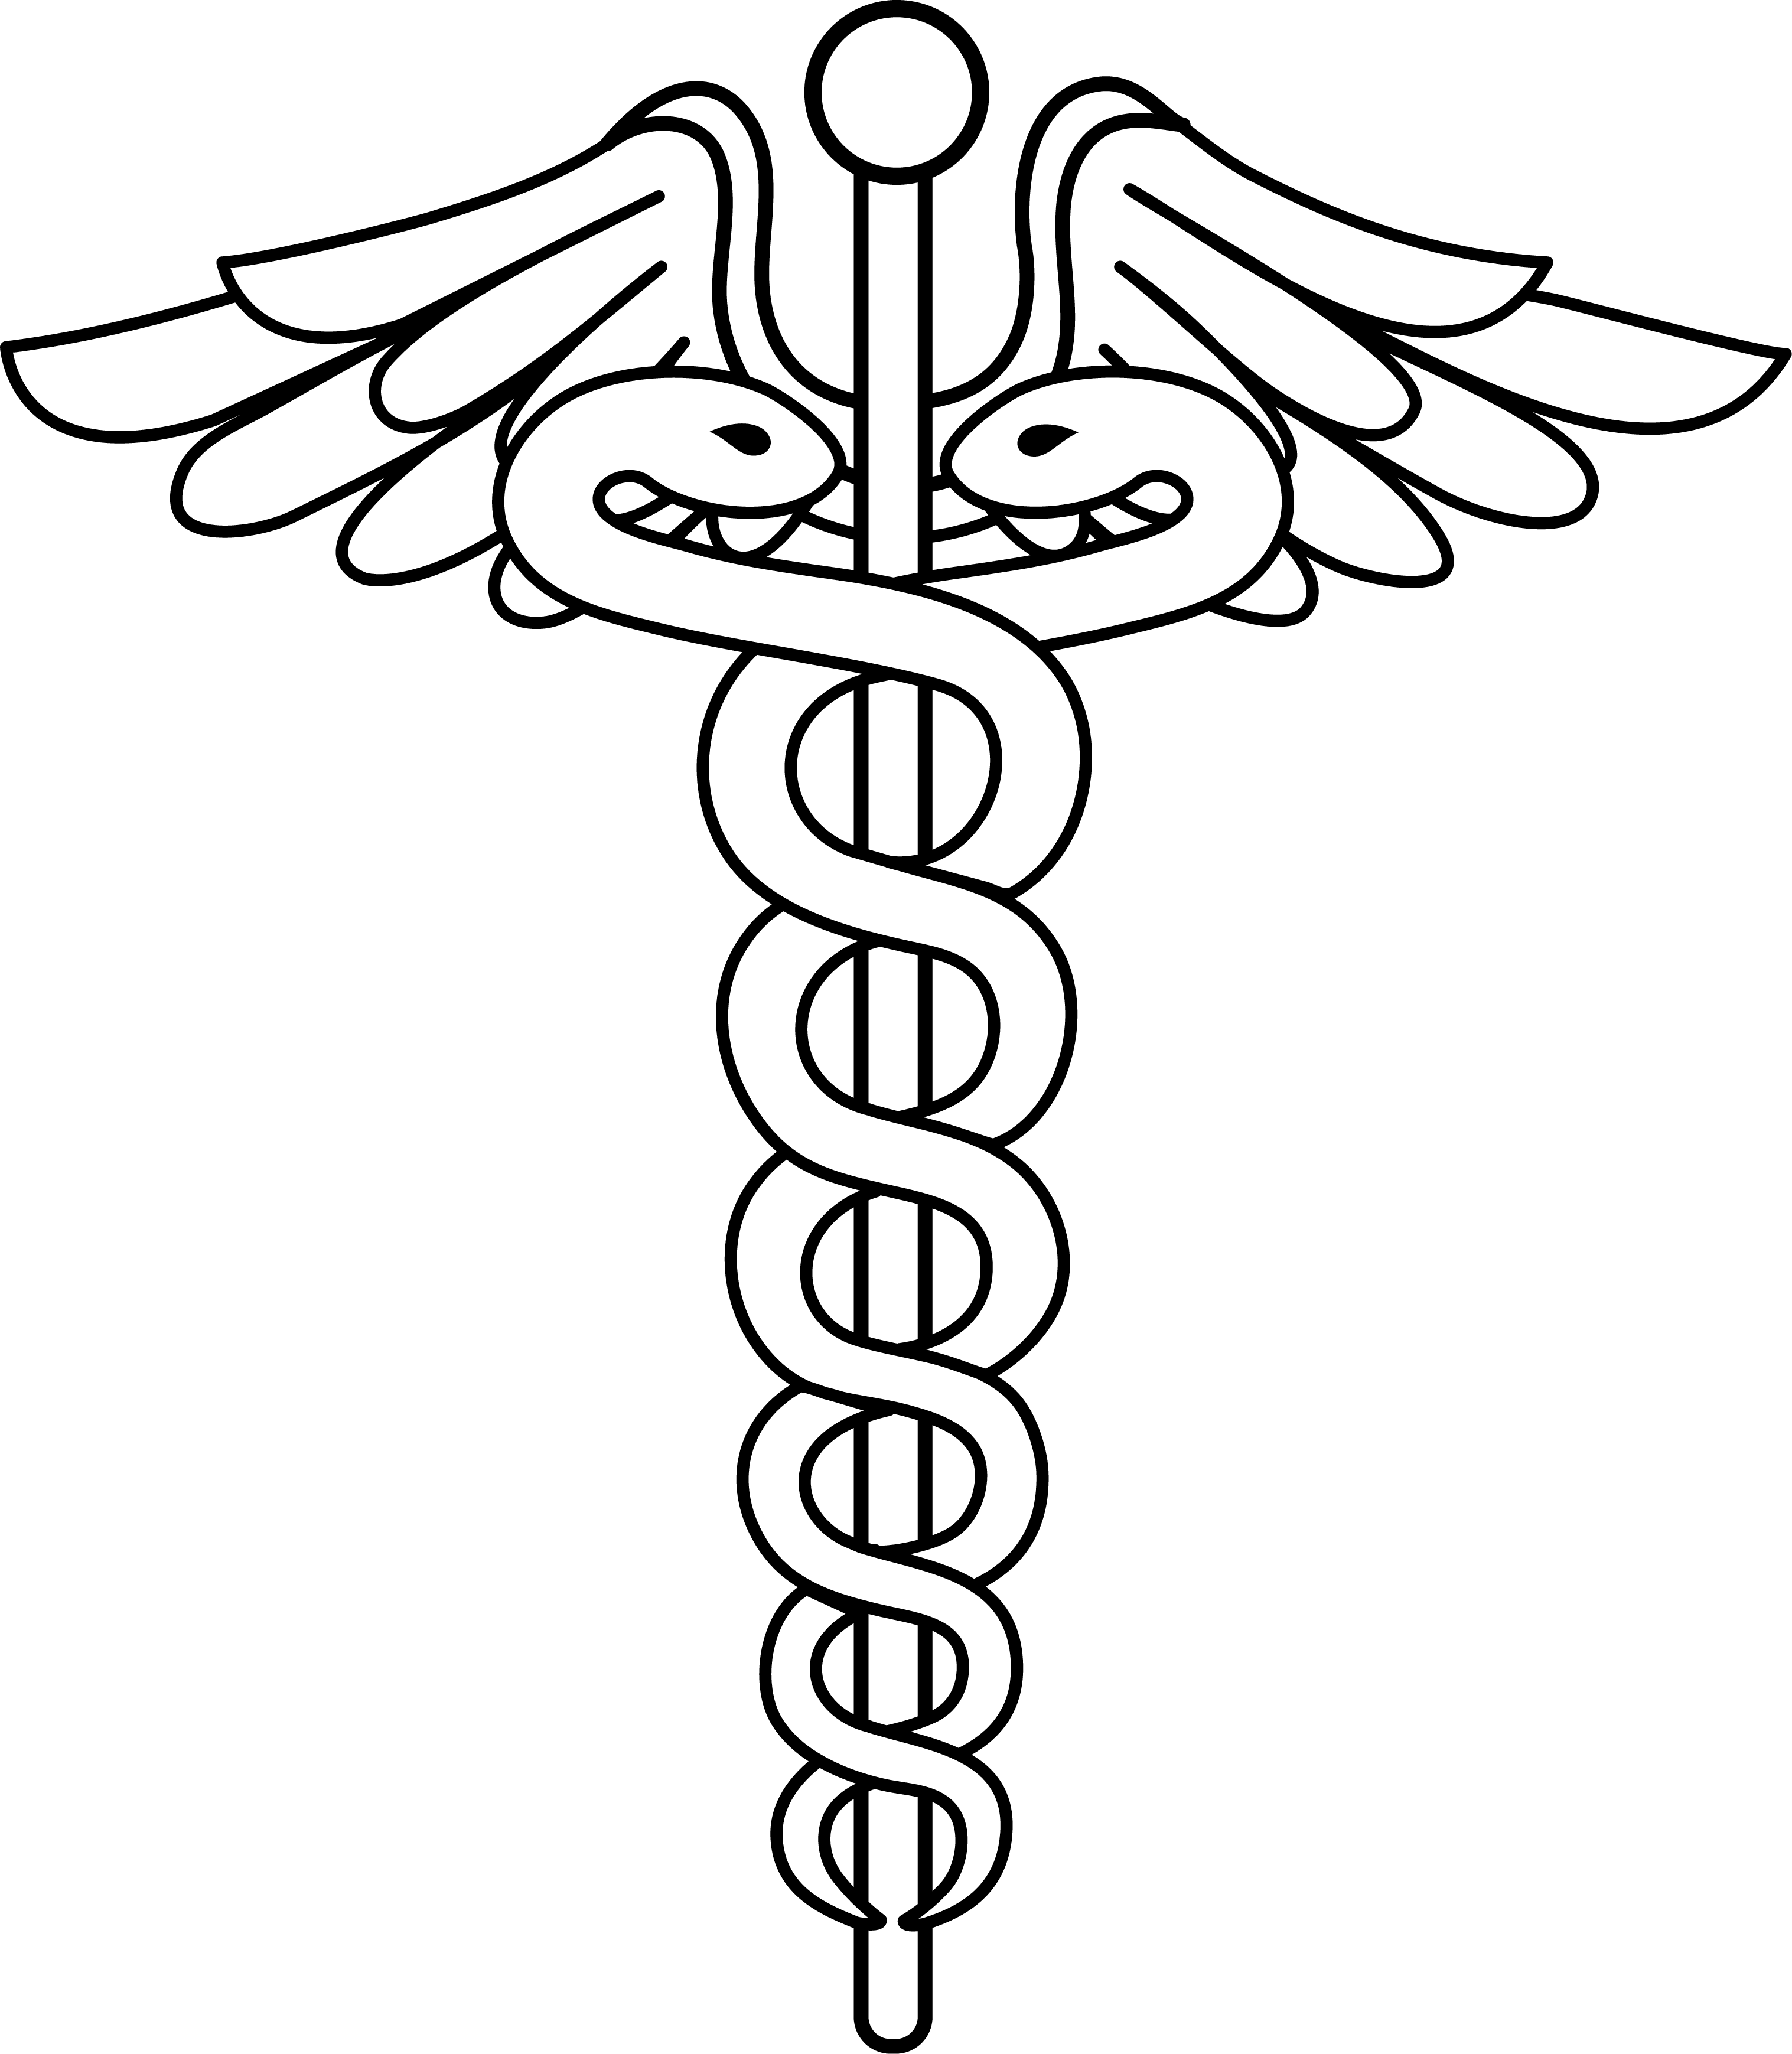 Caduceus Png image #30295. Doctor Symbol PlusPng.com  - Doctor Symbol PNG